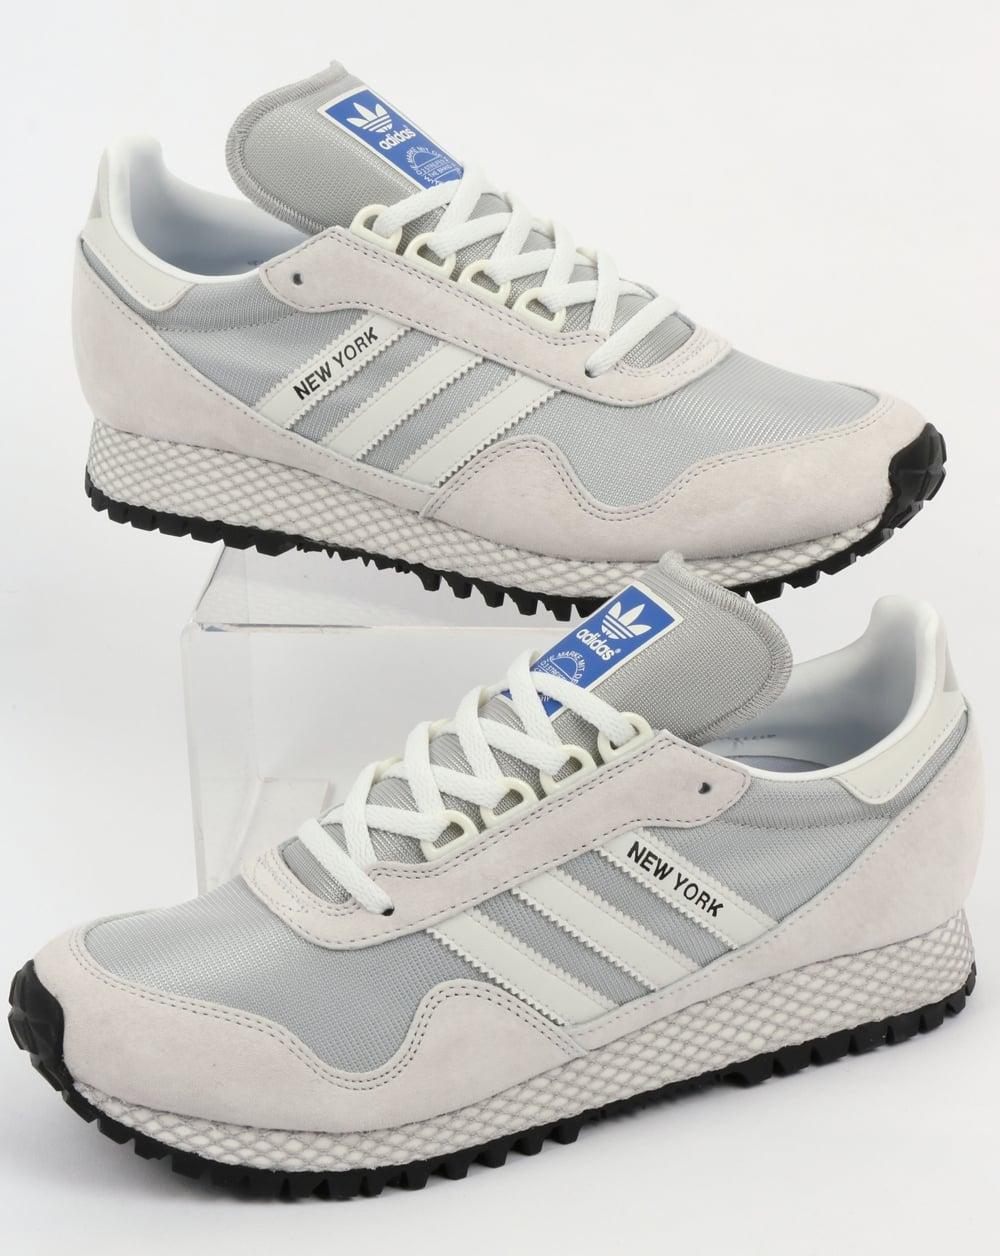 Adidas New York Trainers Crystal White/Grey